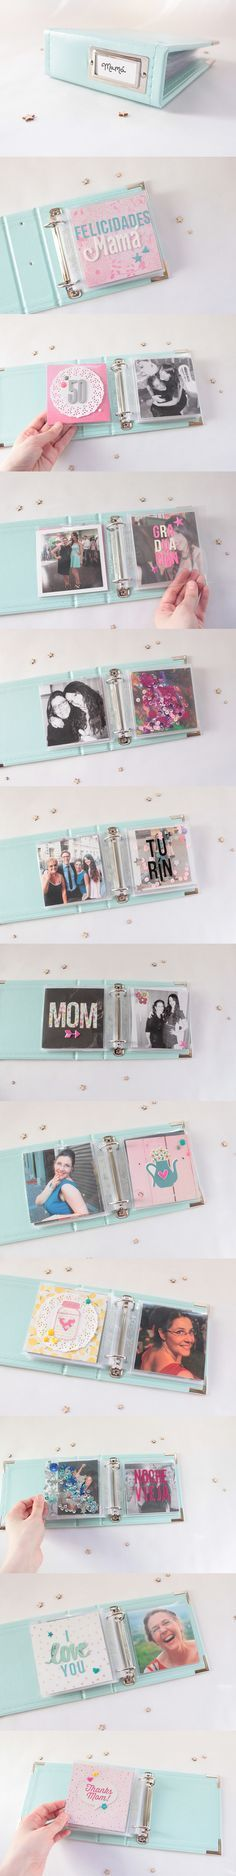 Clear Colours: Mini Album - Mom                                                                                                                                                                                 Más